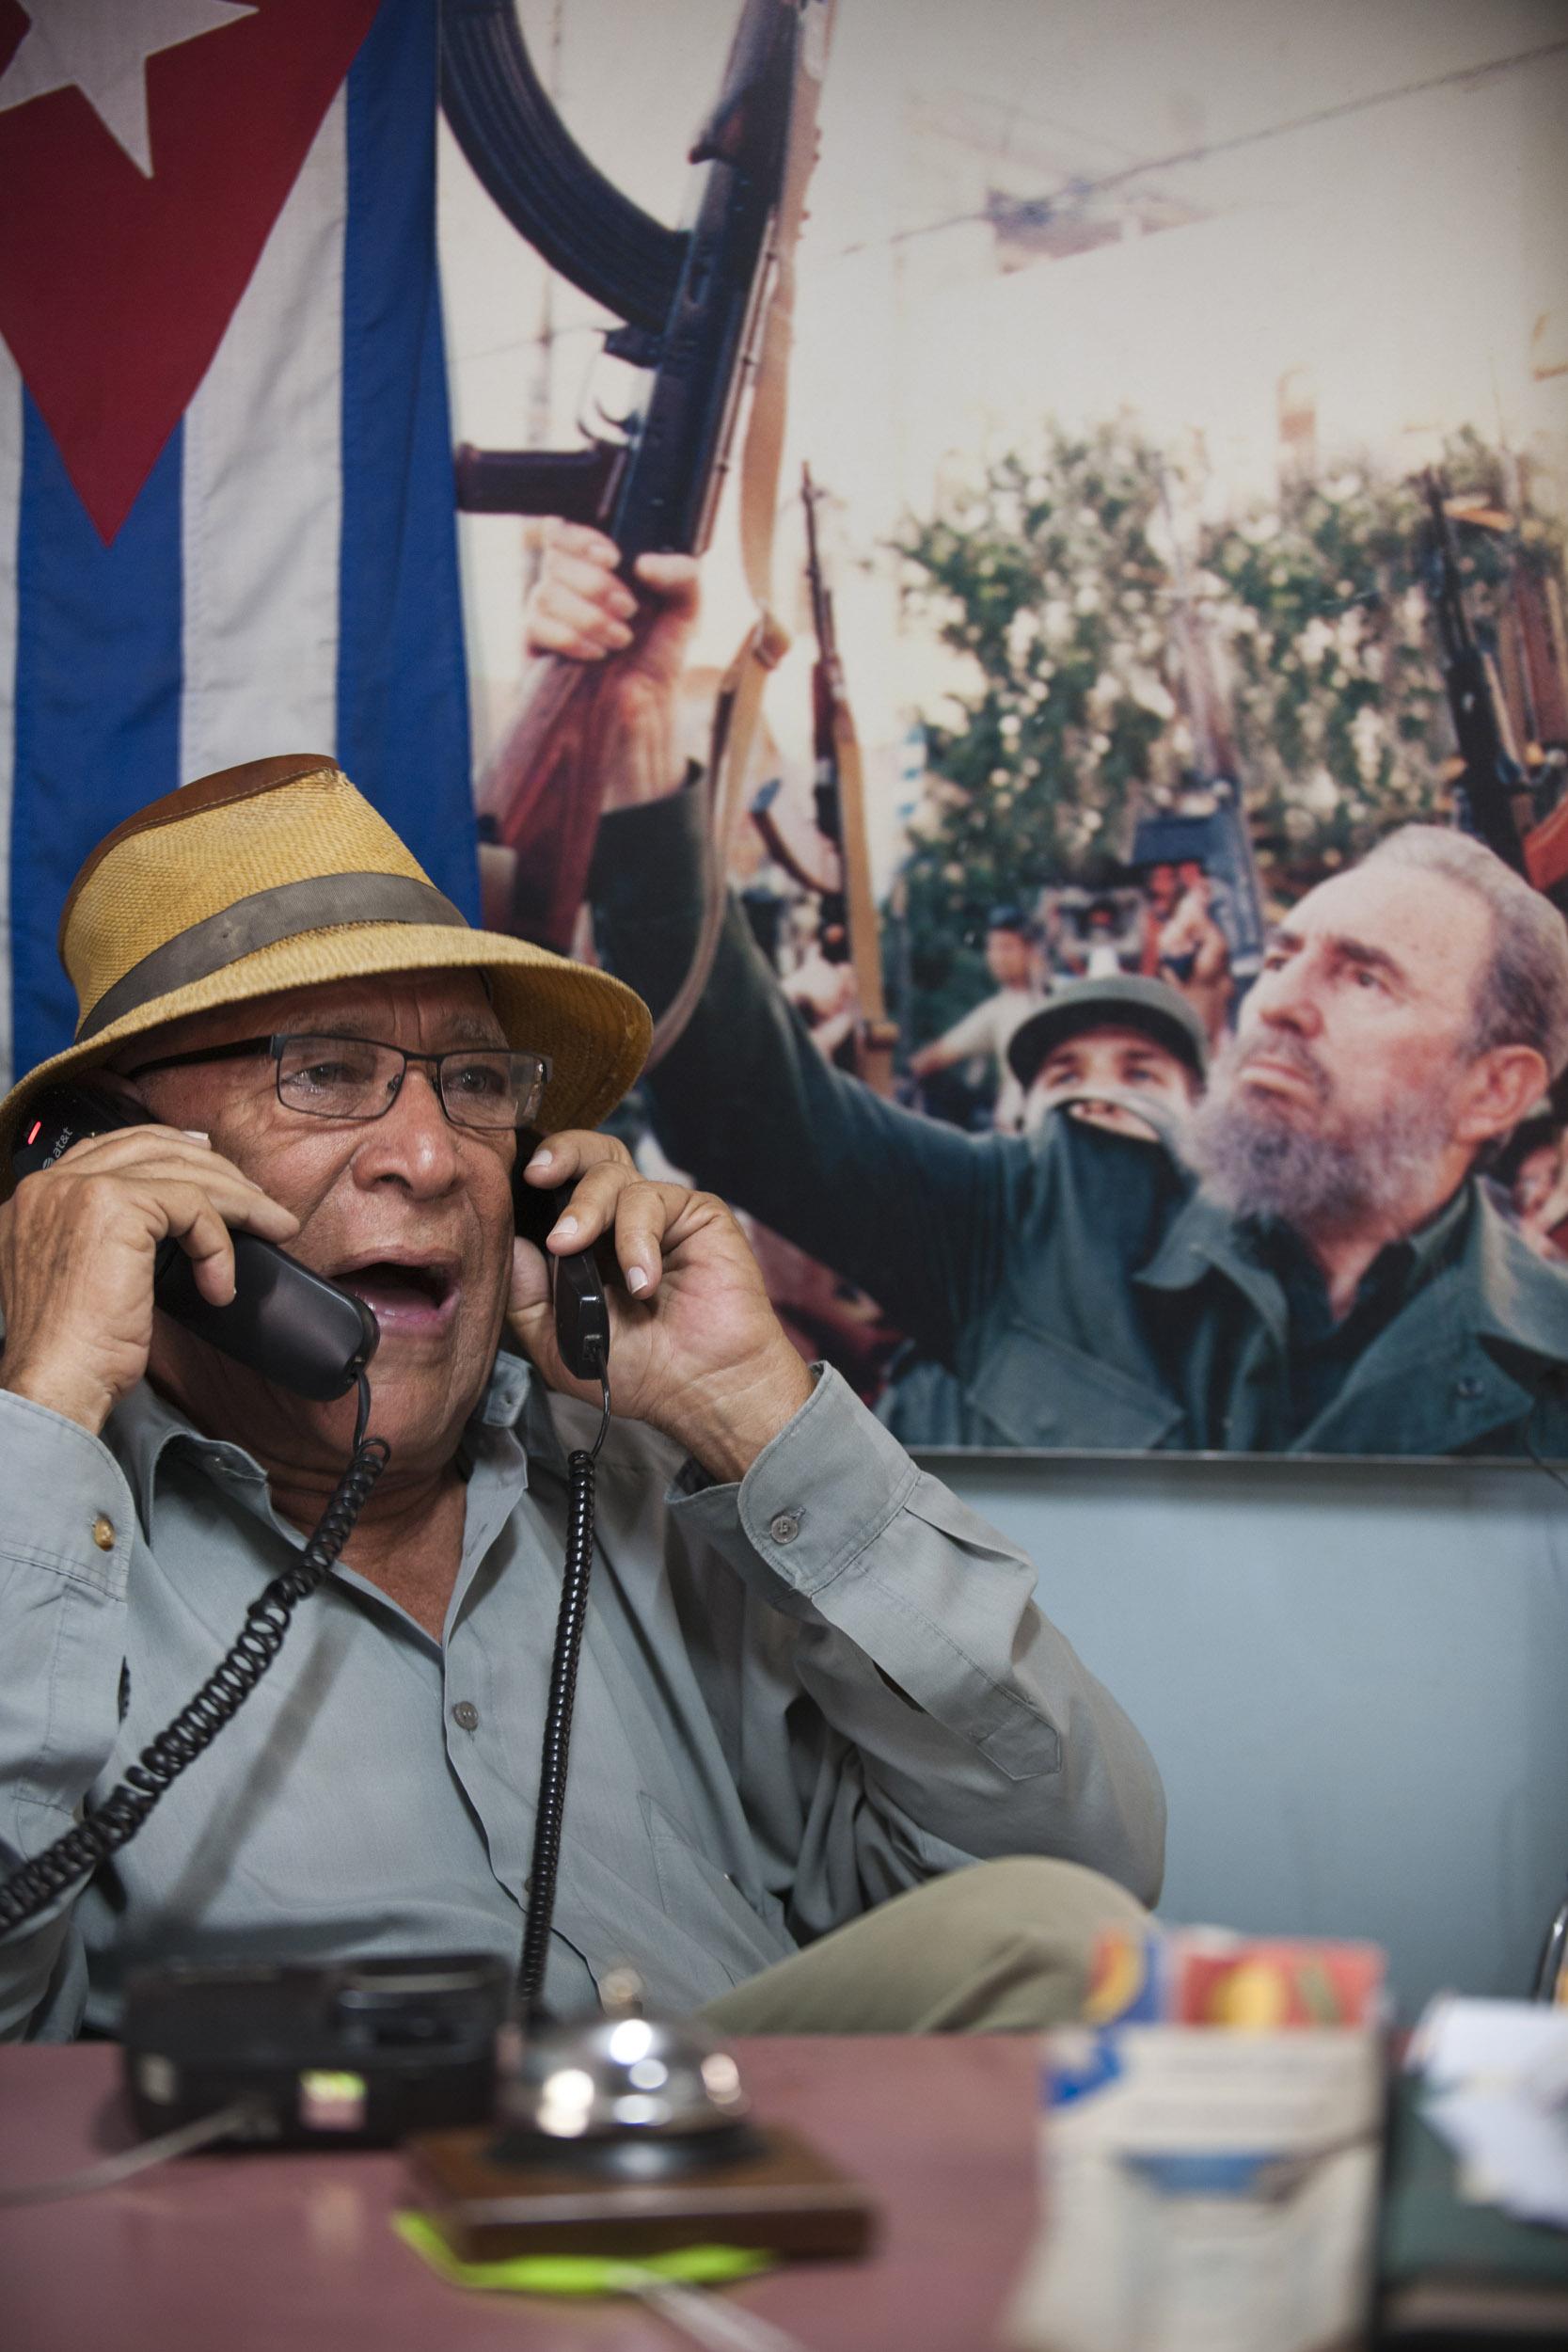 Miguel Ginarte, filmmaker - Illuminated Cuba - Hector Garrido, Aerial and human photography